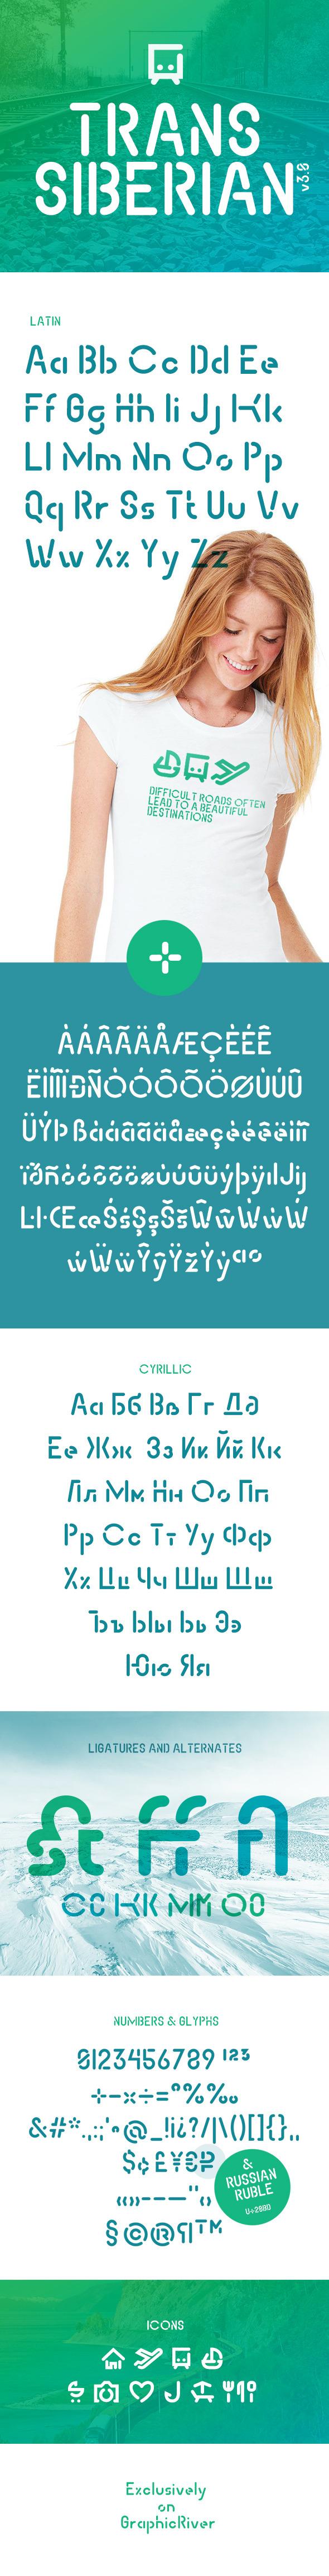 Transsiberian - Stencil & Type Decorative